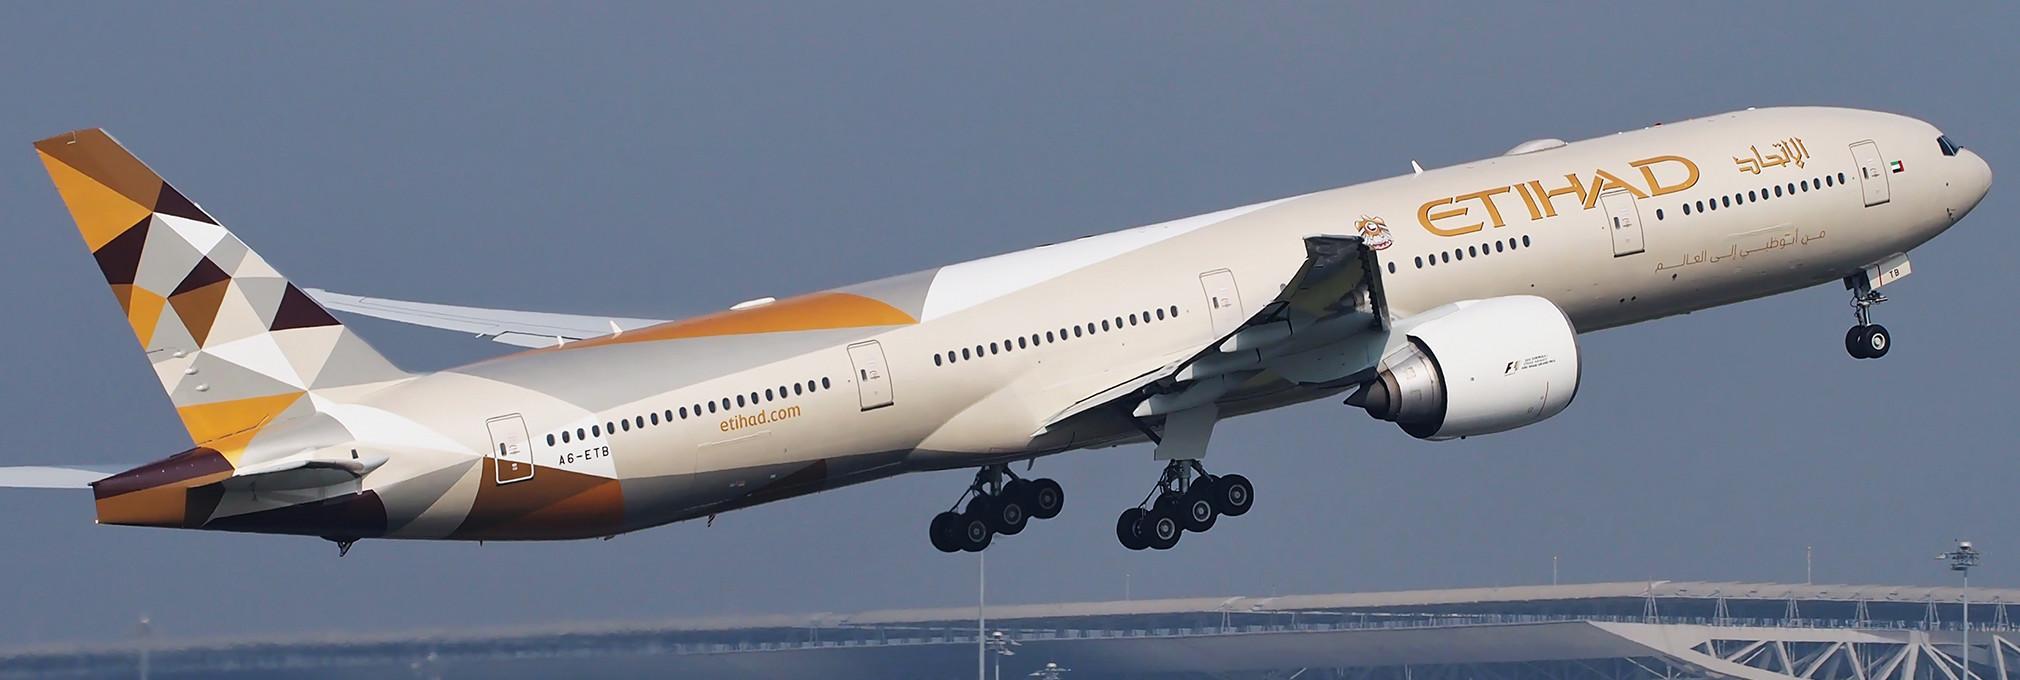 Etihad Airways Discount Coupons And Promo Codes